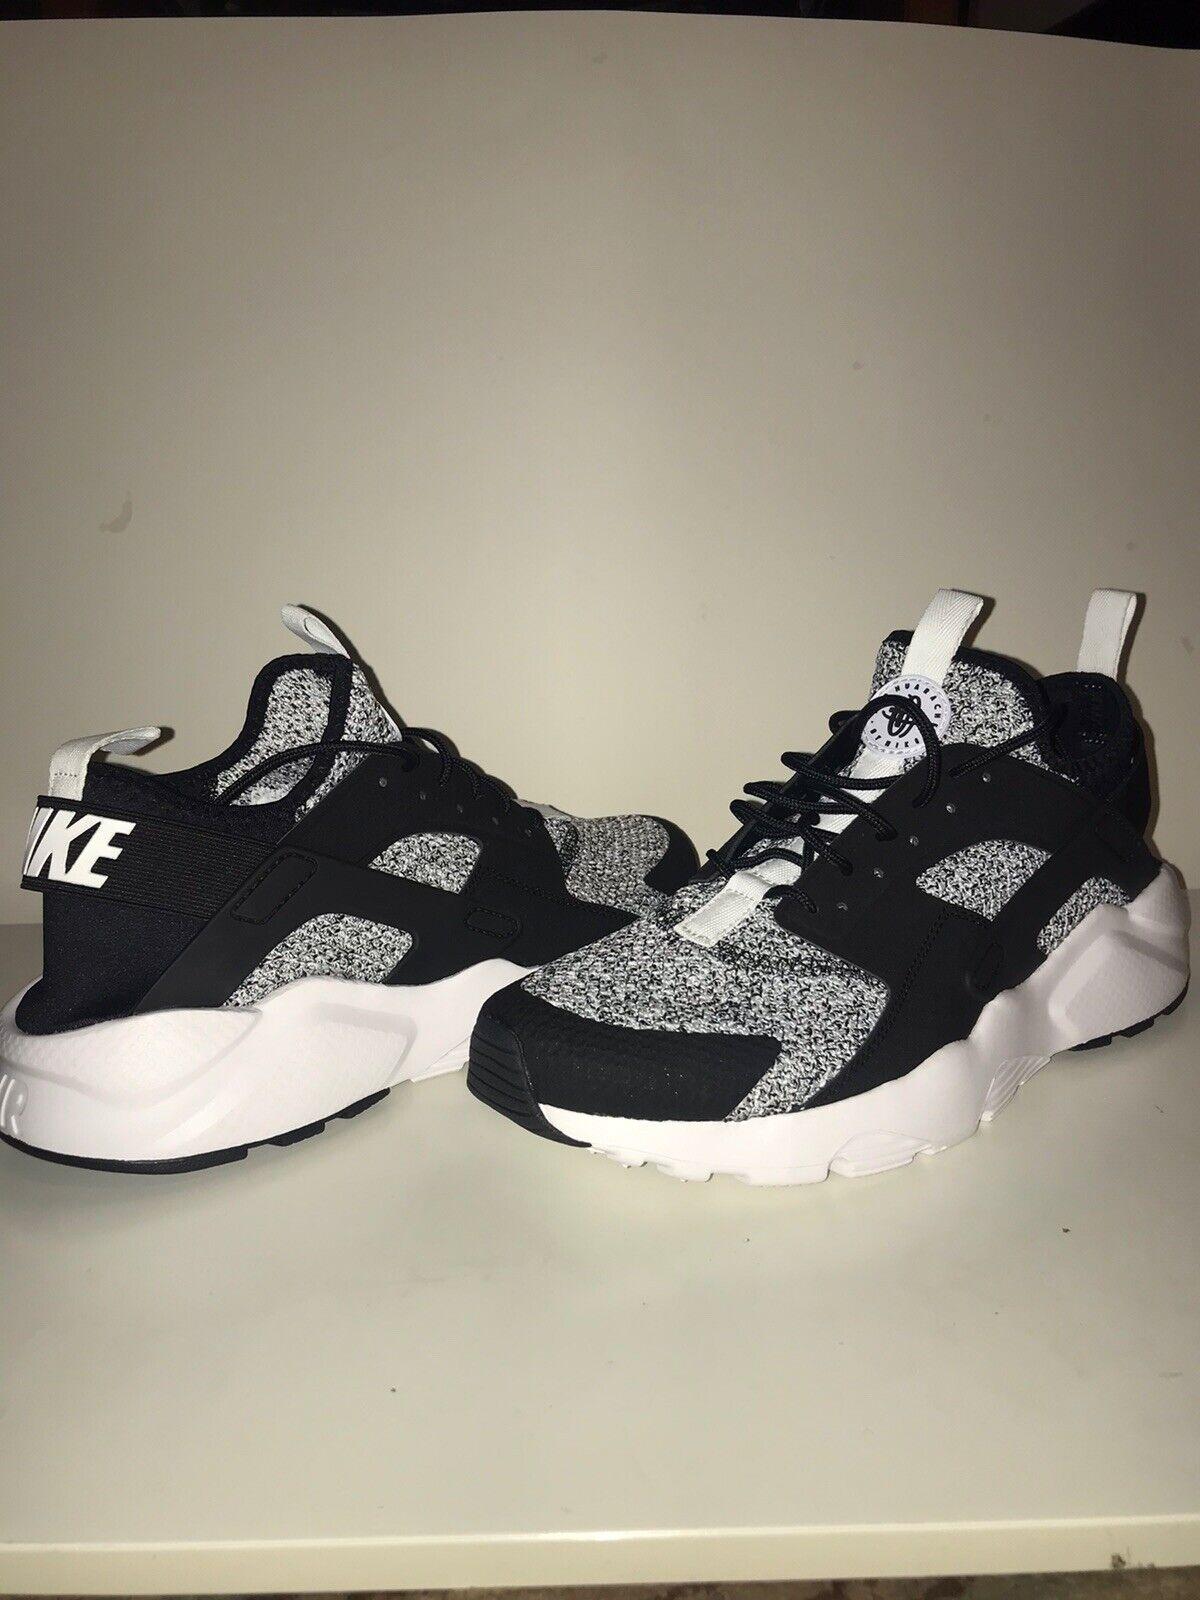 New Nike Air Huarache Run Ultra SE Mens Size 10 Running Shoes 875841-010 NIB